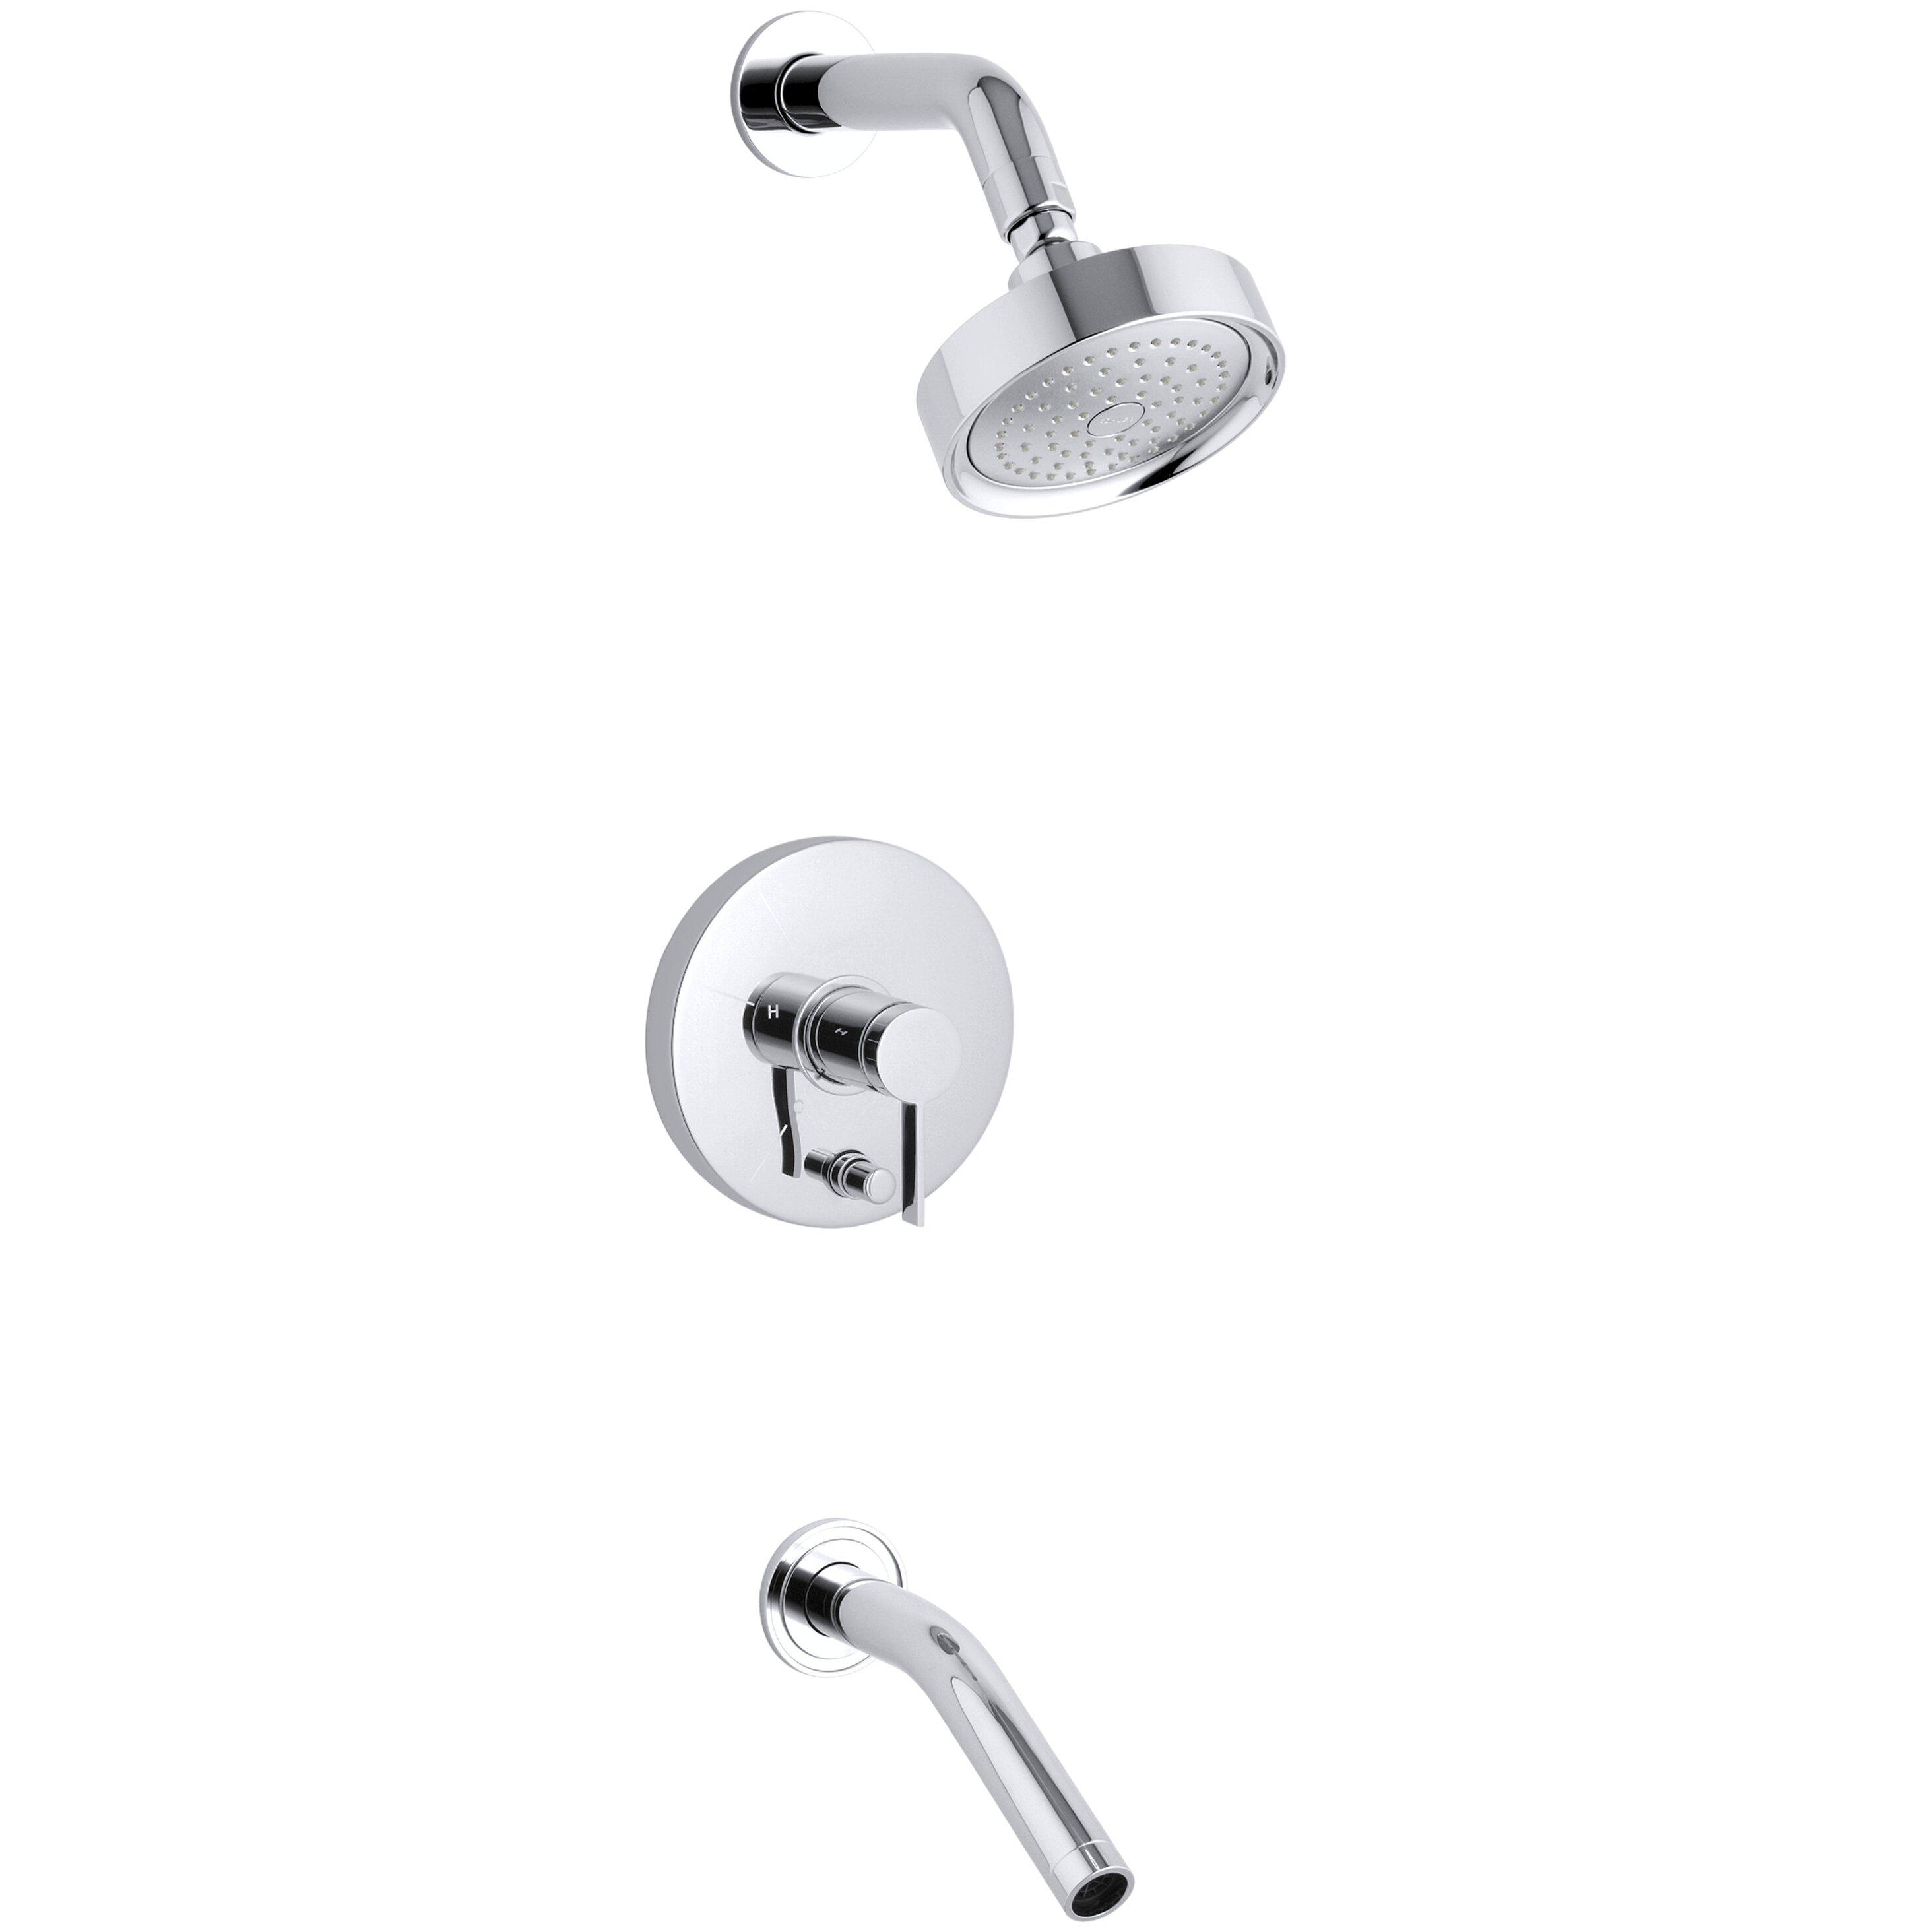 Kohler Stillness Rite-Temp Pressure-Balancing Bath and Shower ... - Kohler Stillness Rite-Temp Pressure-Balancing Bath and Shower Faucet Trim  with Lever Handle